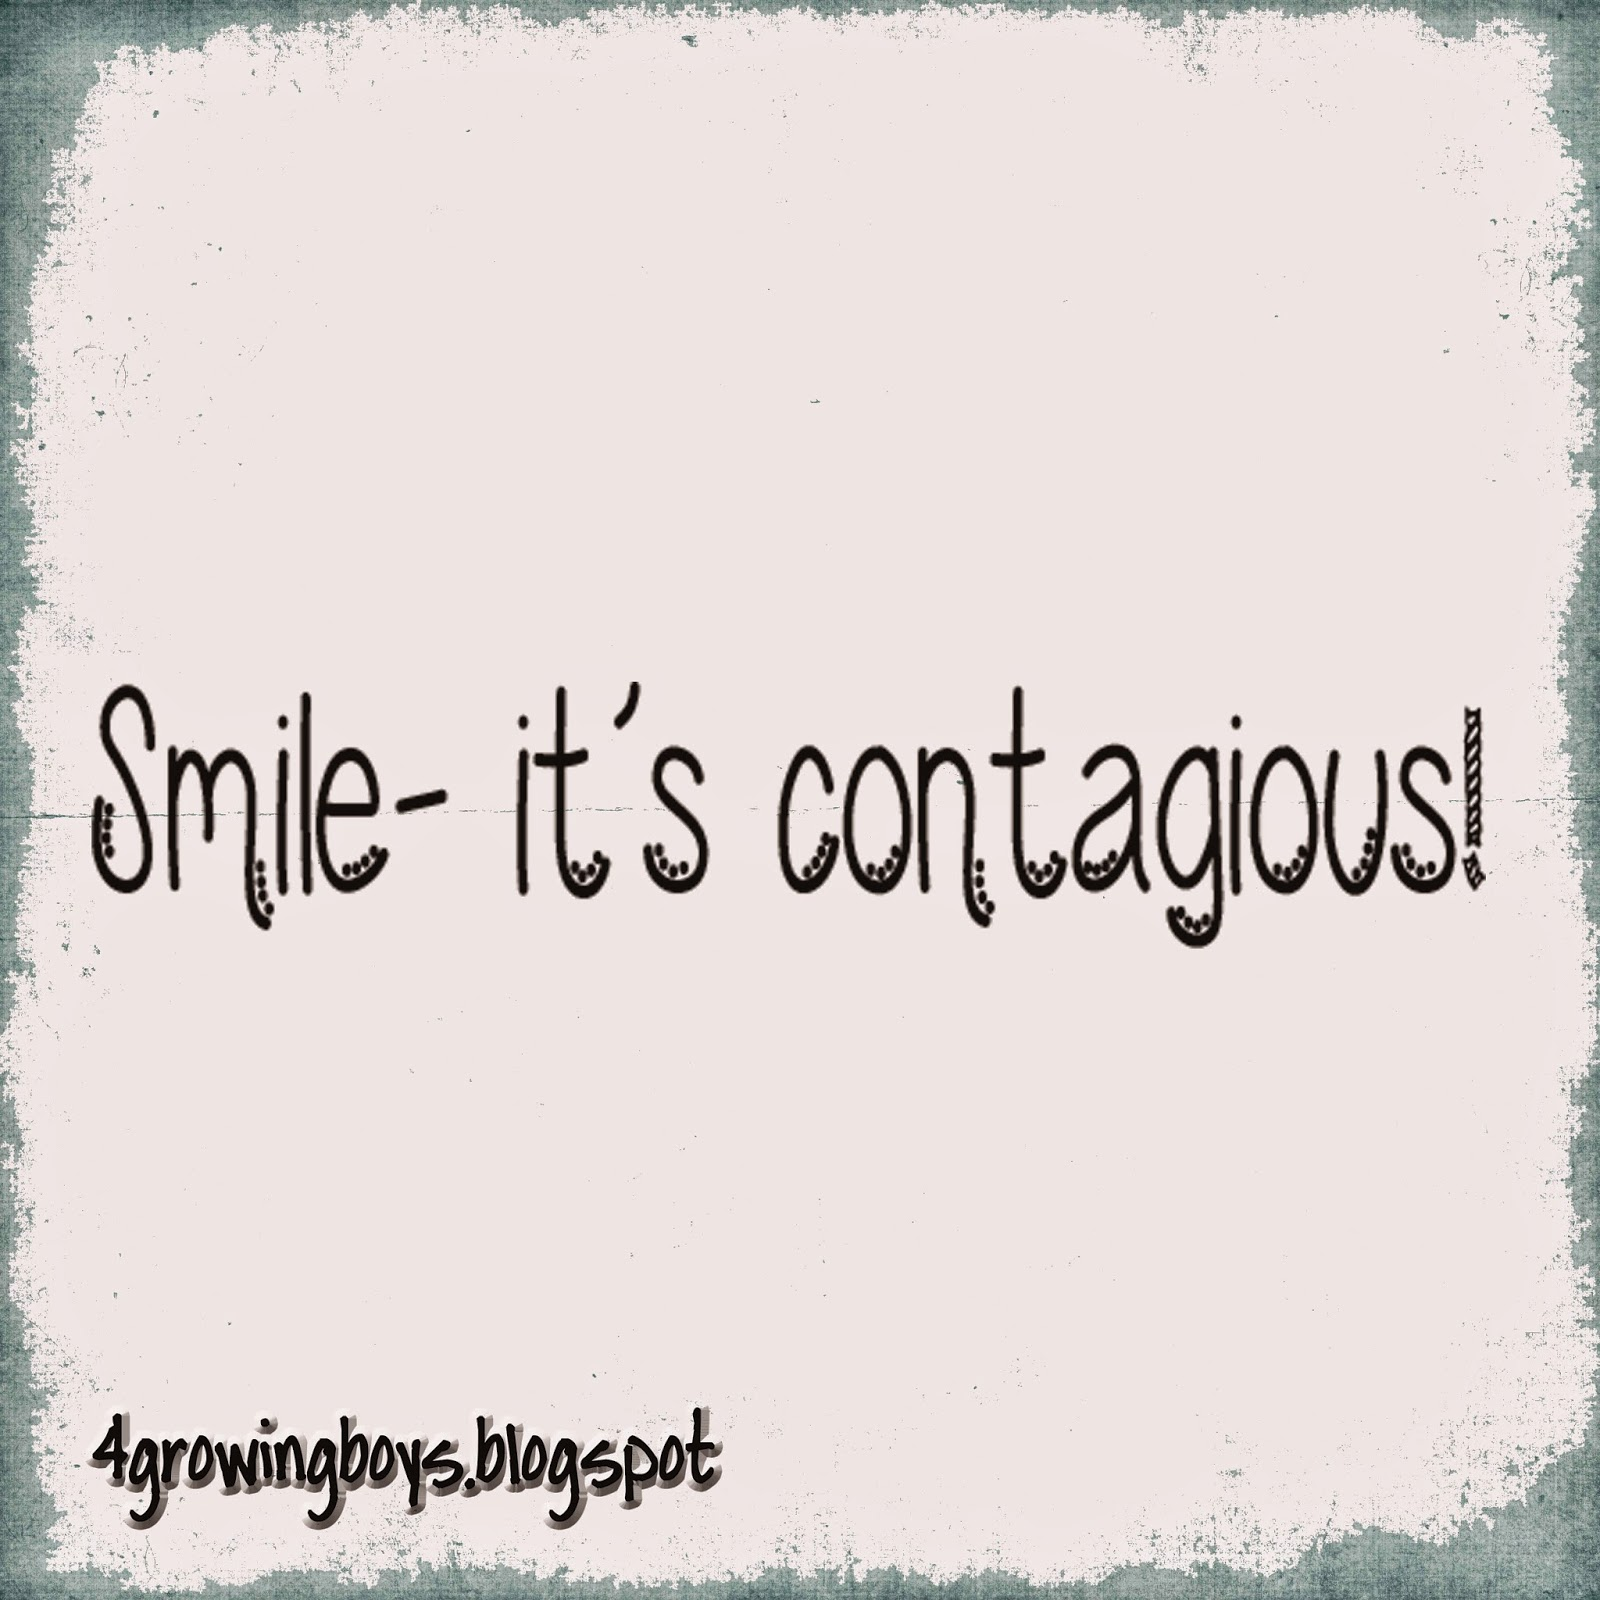 http://3.bp.blogspot.com/-2D5z1CrtSRo/VPy-hPGYB6I/AAAAAAAALOM/7Utdql1GciA/s1600/Smile-%2Bit's%2Bcontagious.jpg